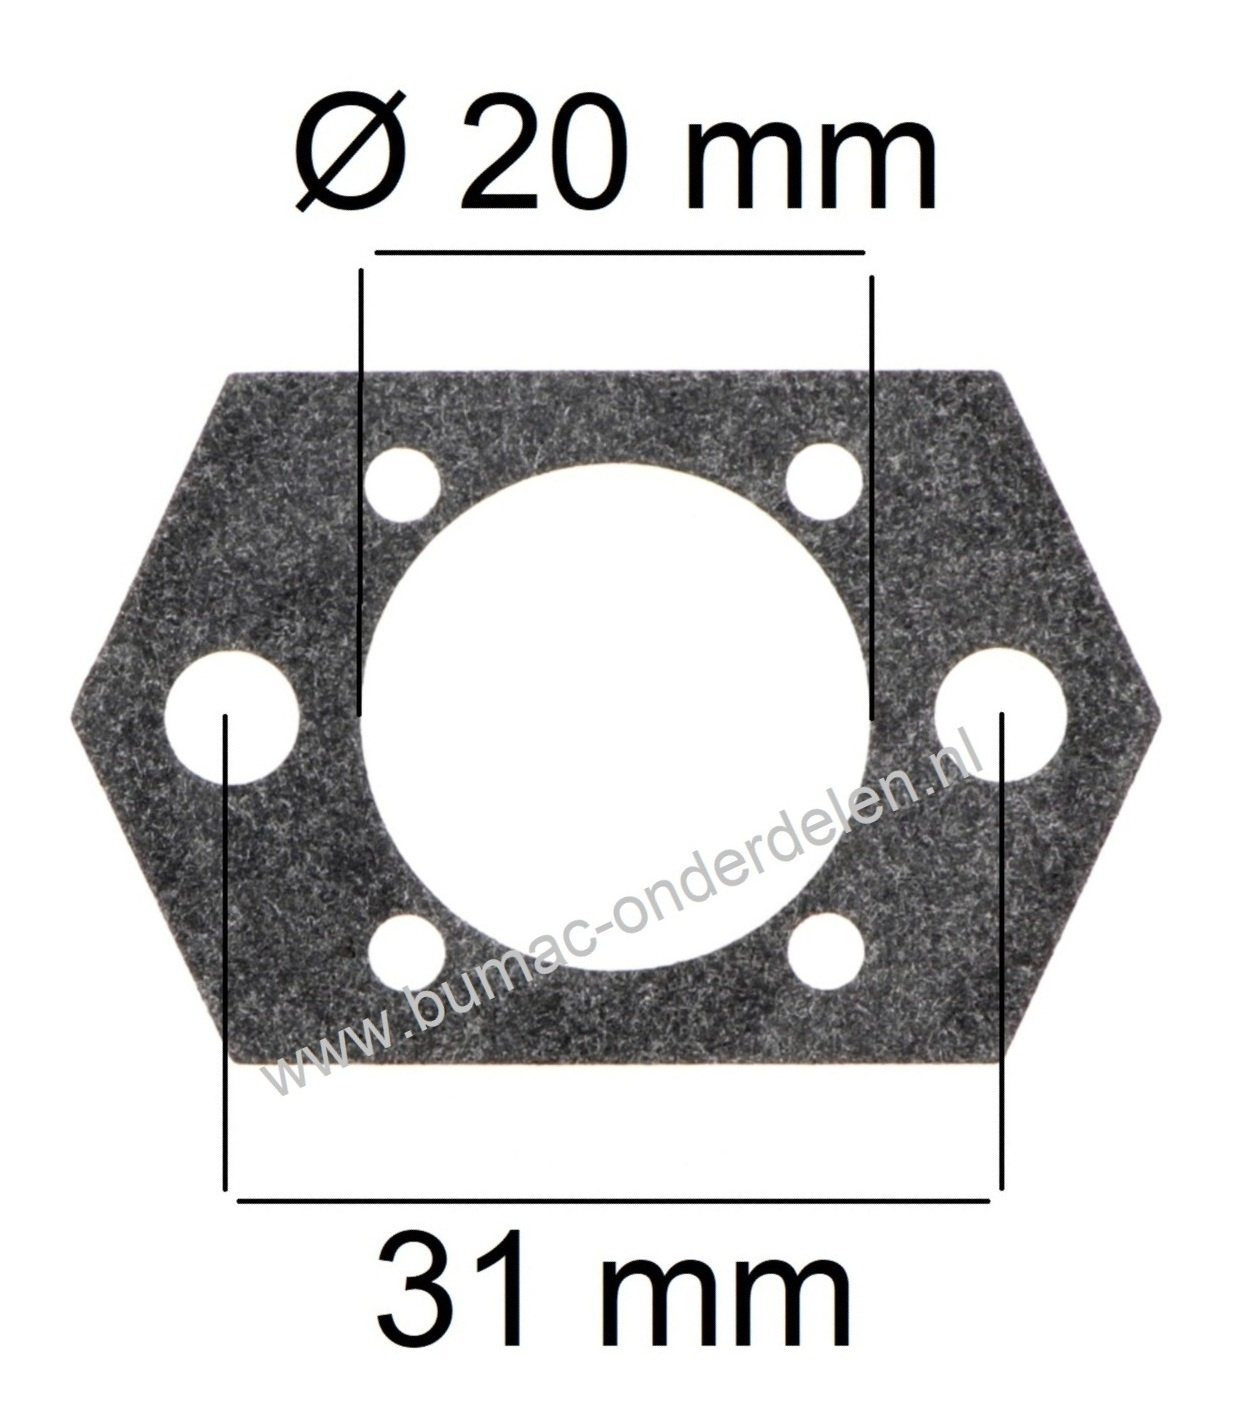 Inlaatpakking voor Stihl BR320, BR400, BR320L, SR320